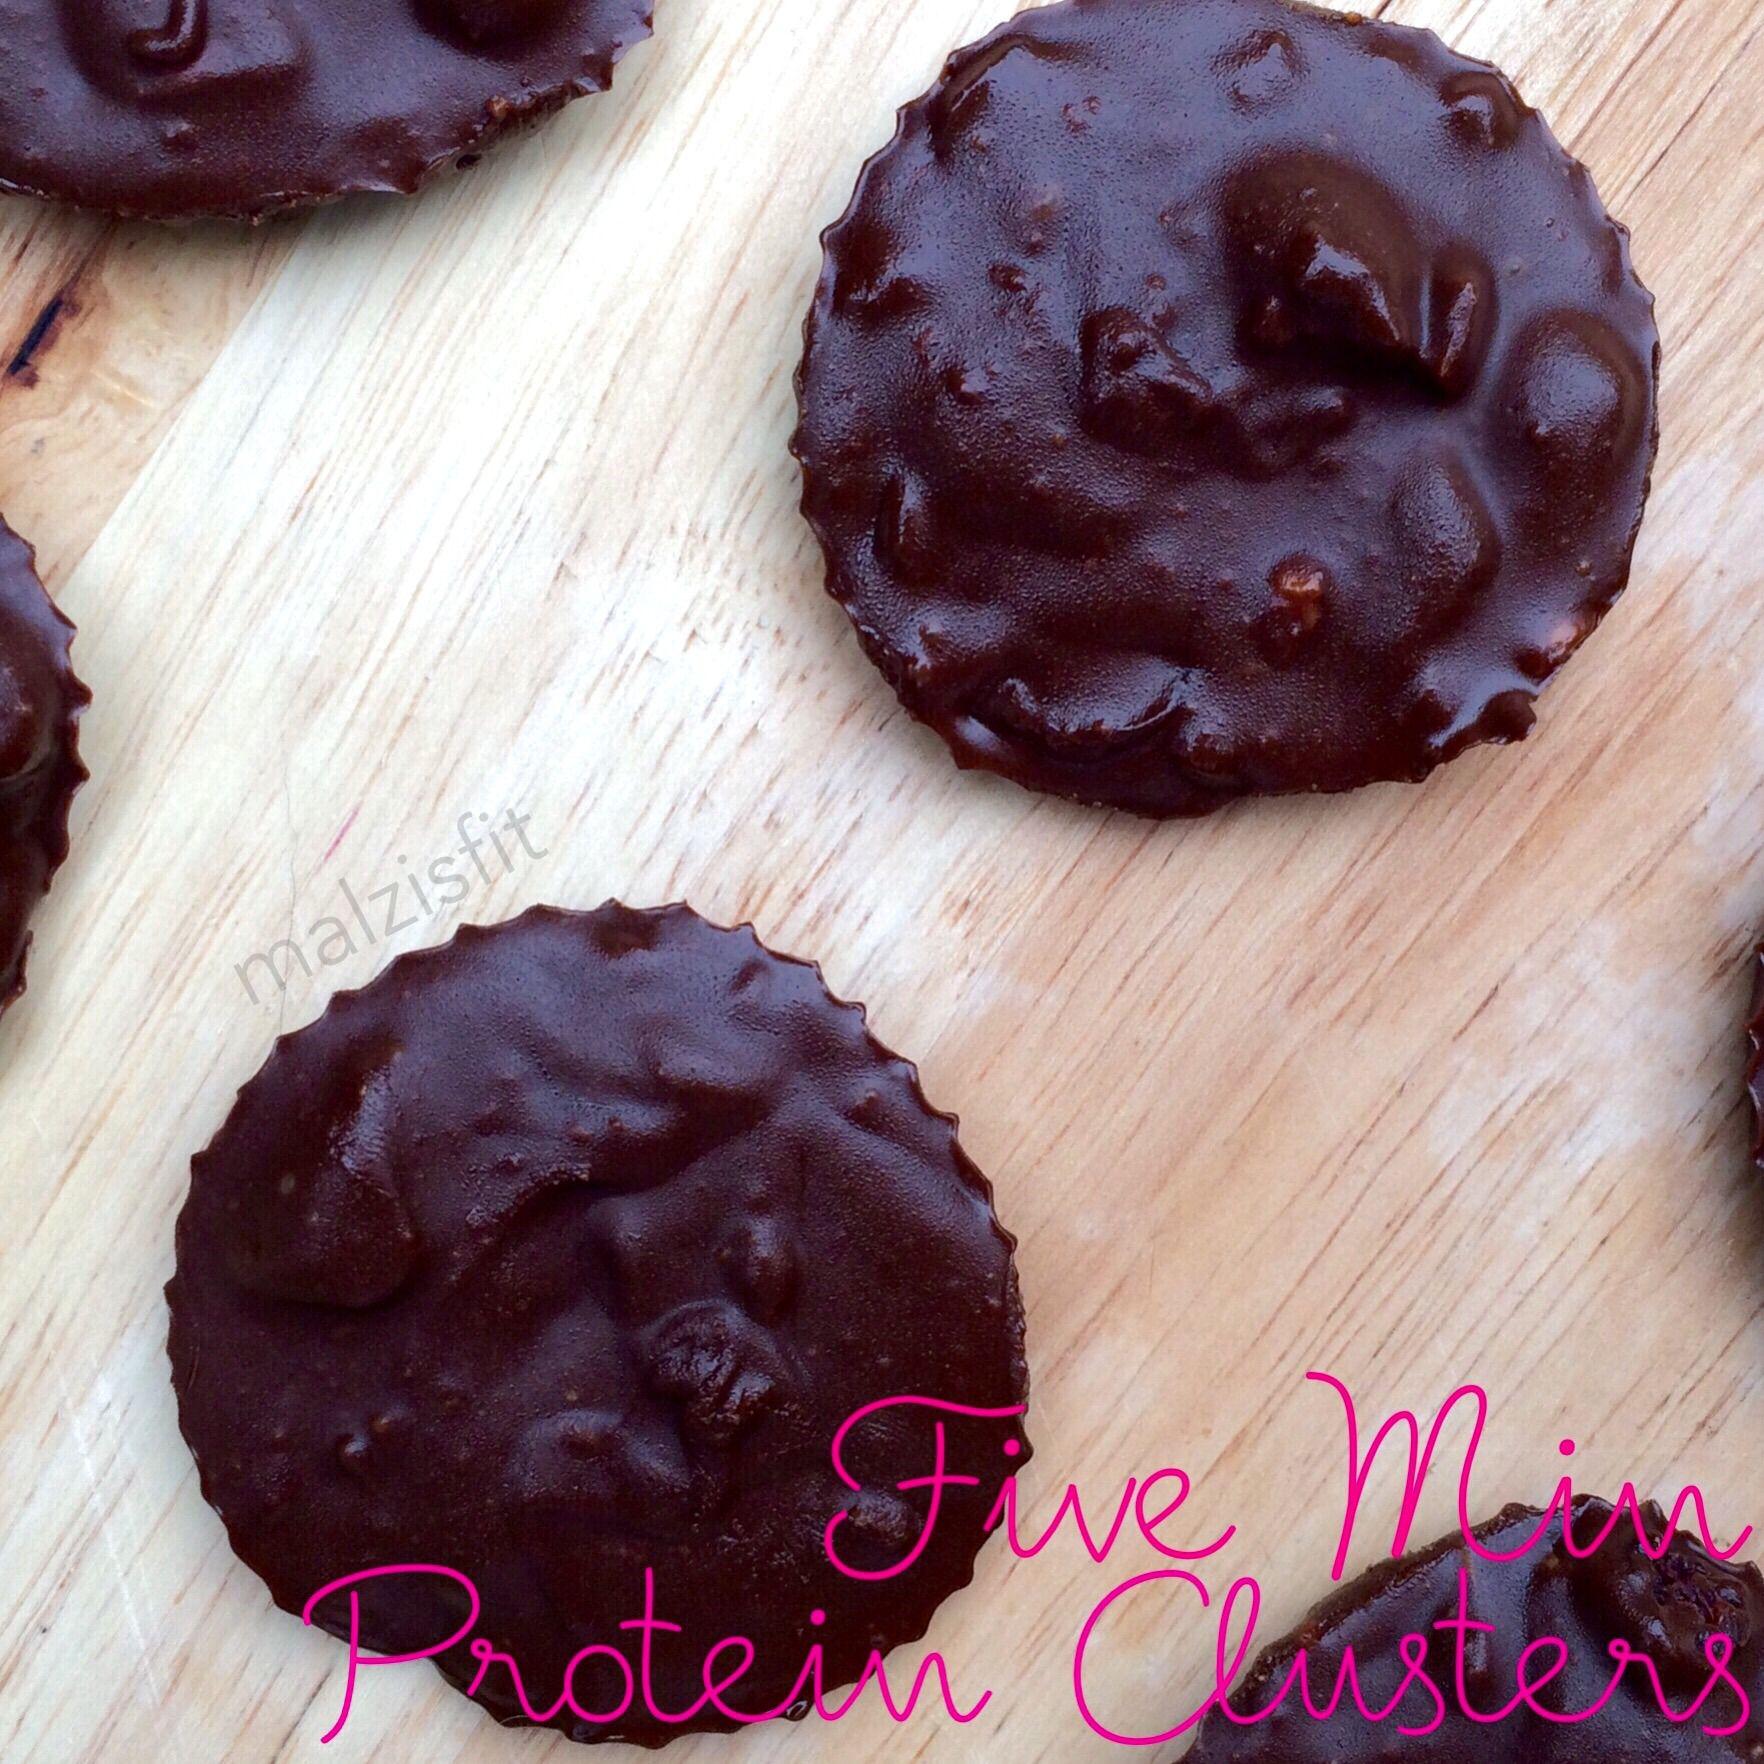 Five Minute Dark Chocolate Protein Clusters